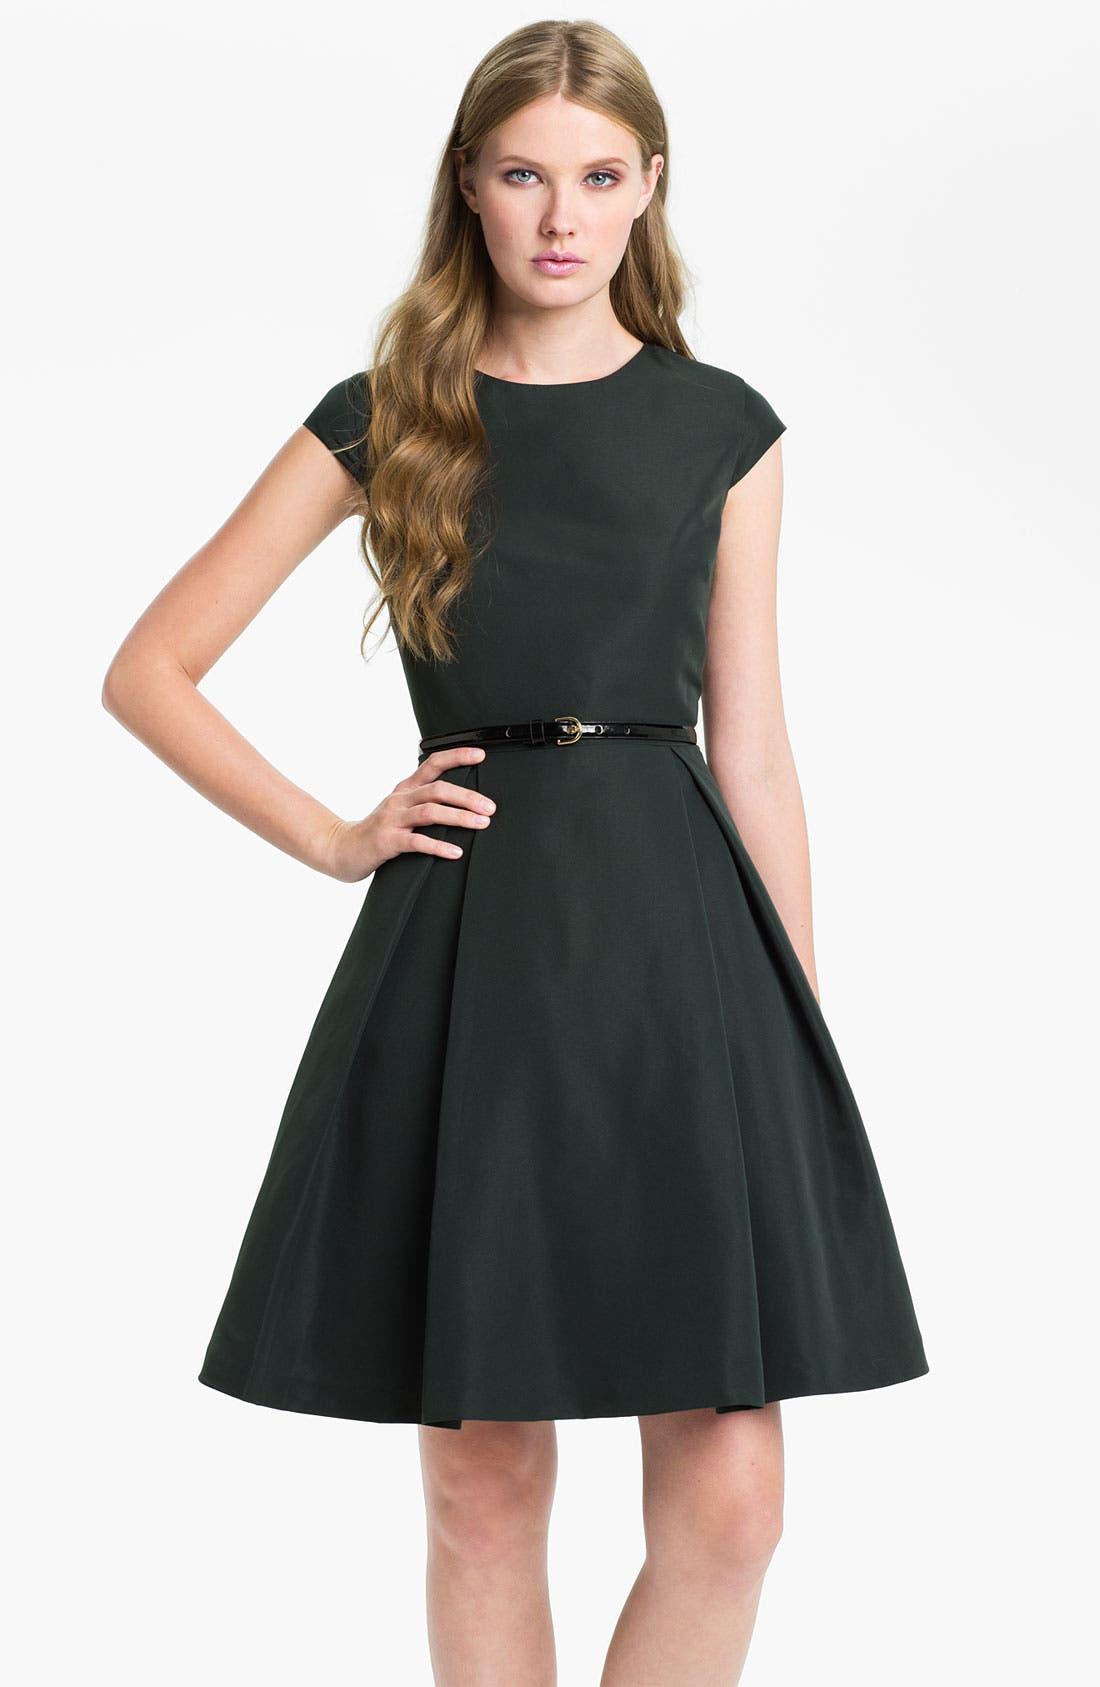 Alternate Image 1 Selected - Ted Baker London 'Ladi' Fit & Flare Dress